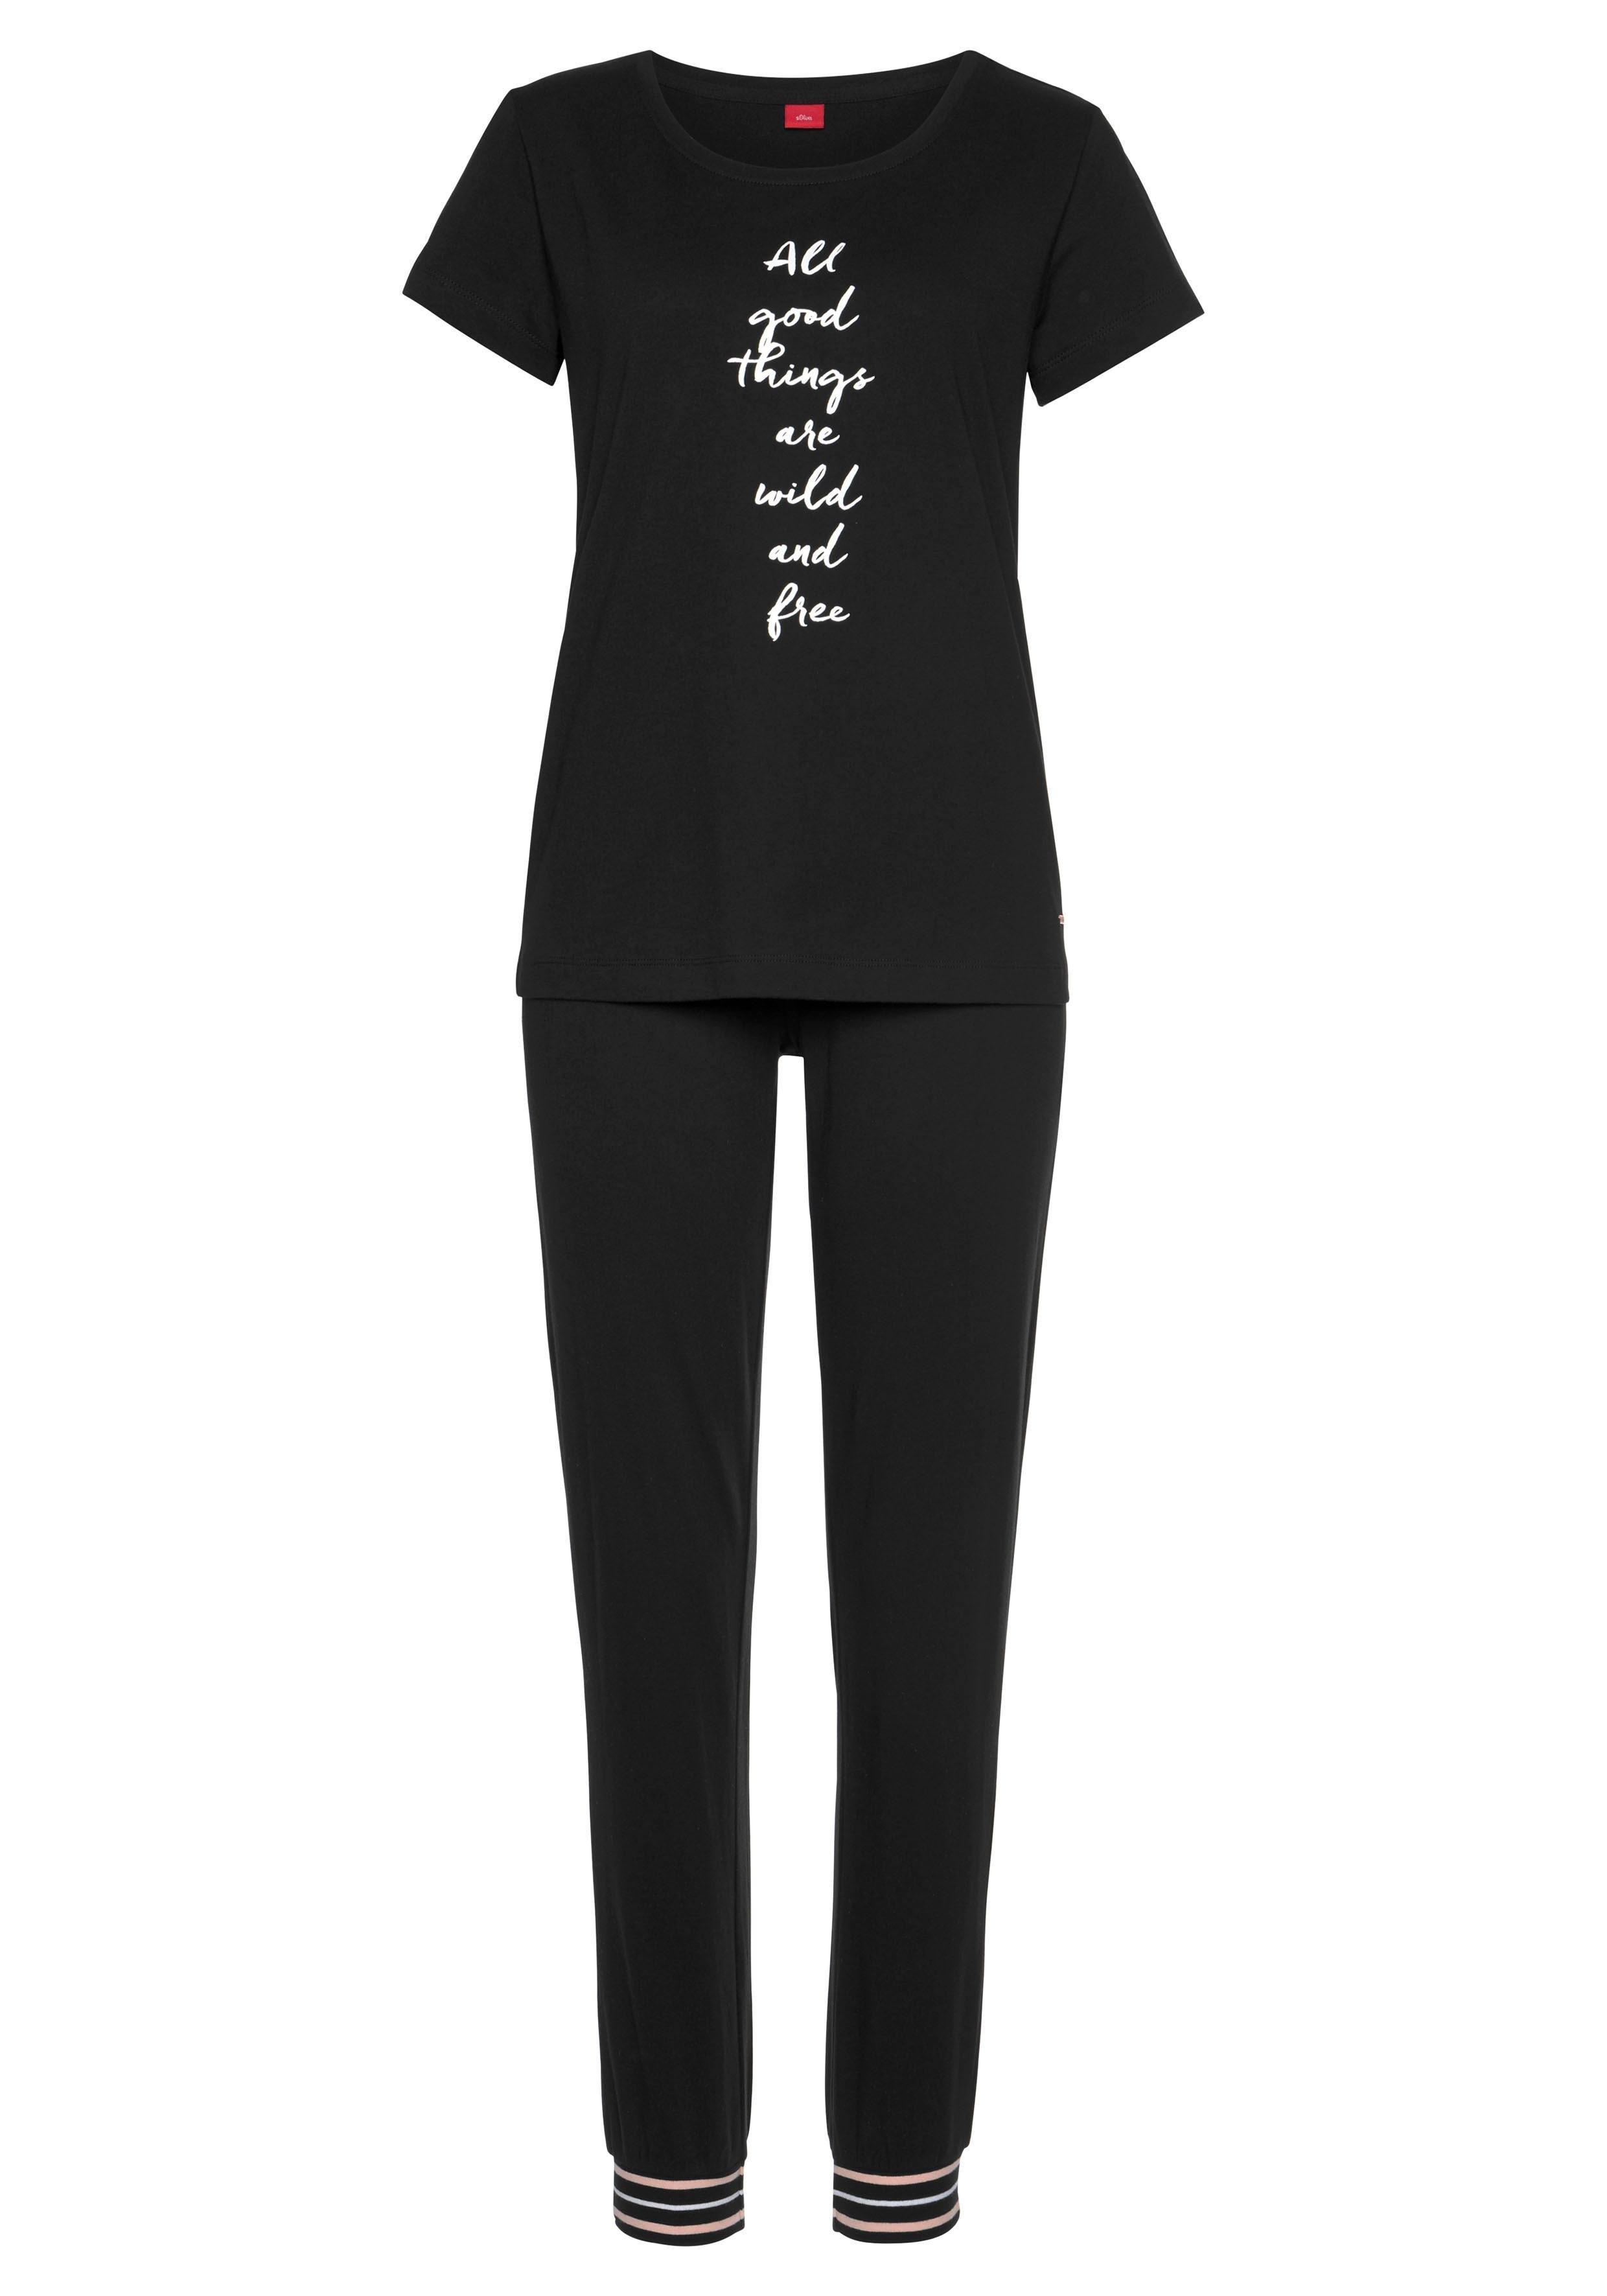 S.oliver Bodywear pyjama - gratis ruilen op lascana.nl